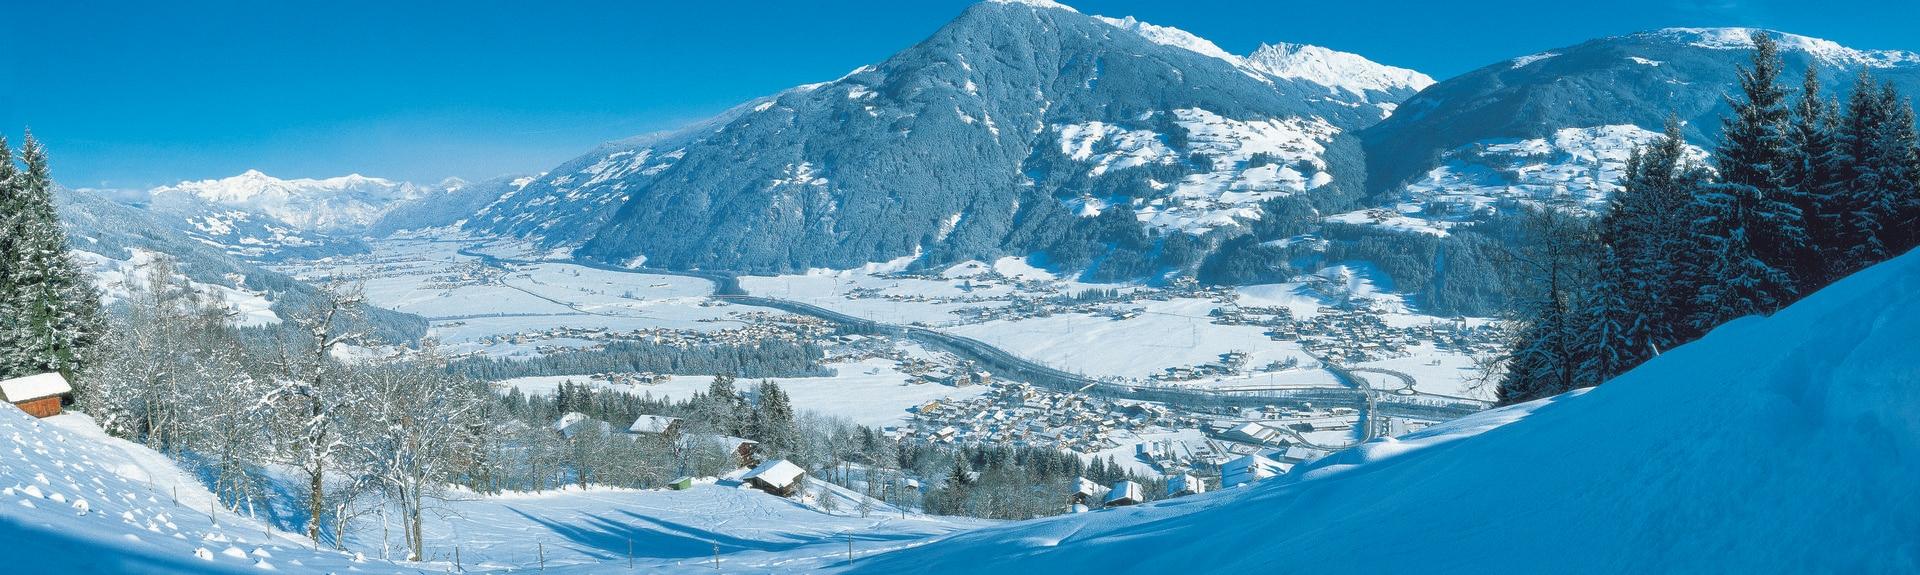 Hochfuegen 2000 Ski Lift, Fuegenberg, Austria